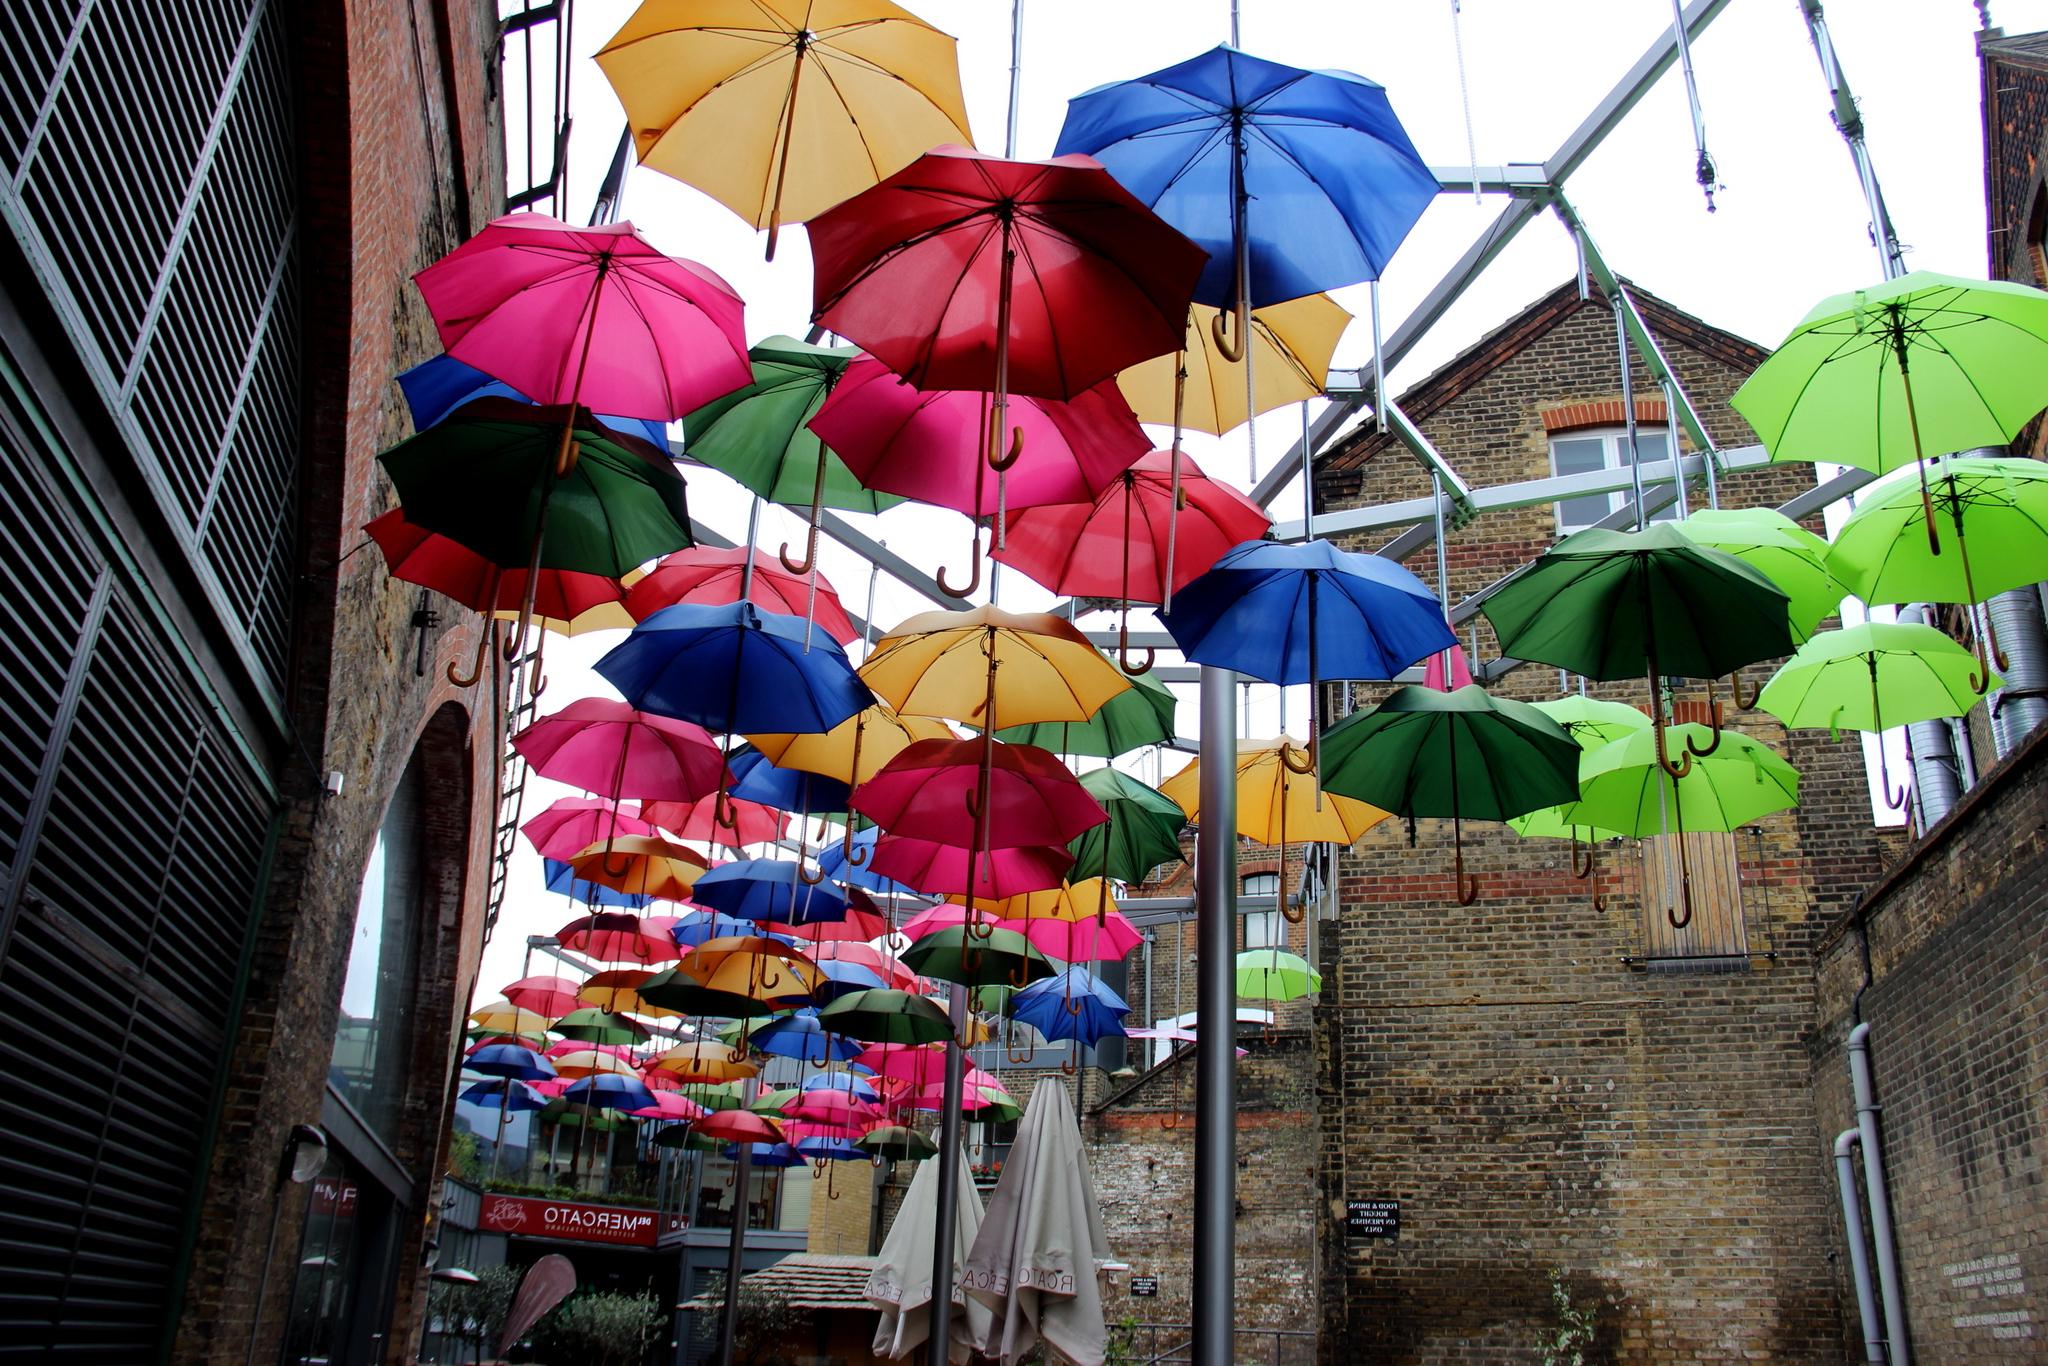 Travel: London Daily Diary 5 – Big Ben, Brick Lane & Borough Market Throughout Well Liked Wier Market Umbrellas (View 11 of 20)